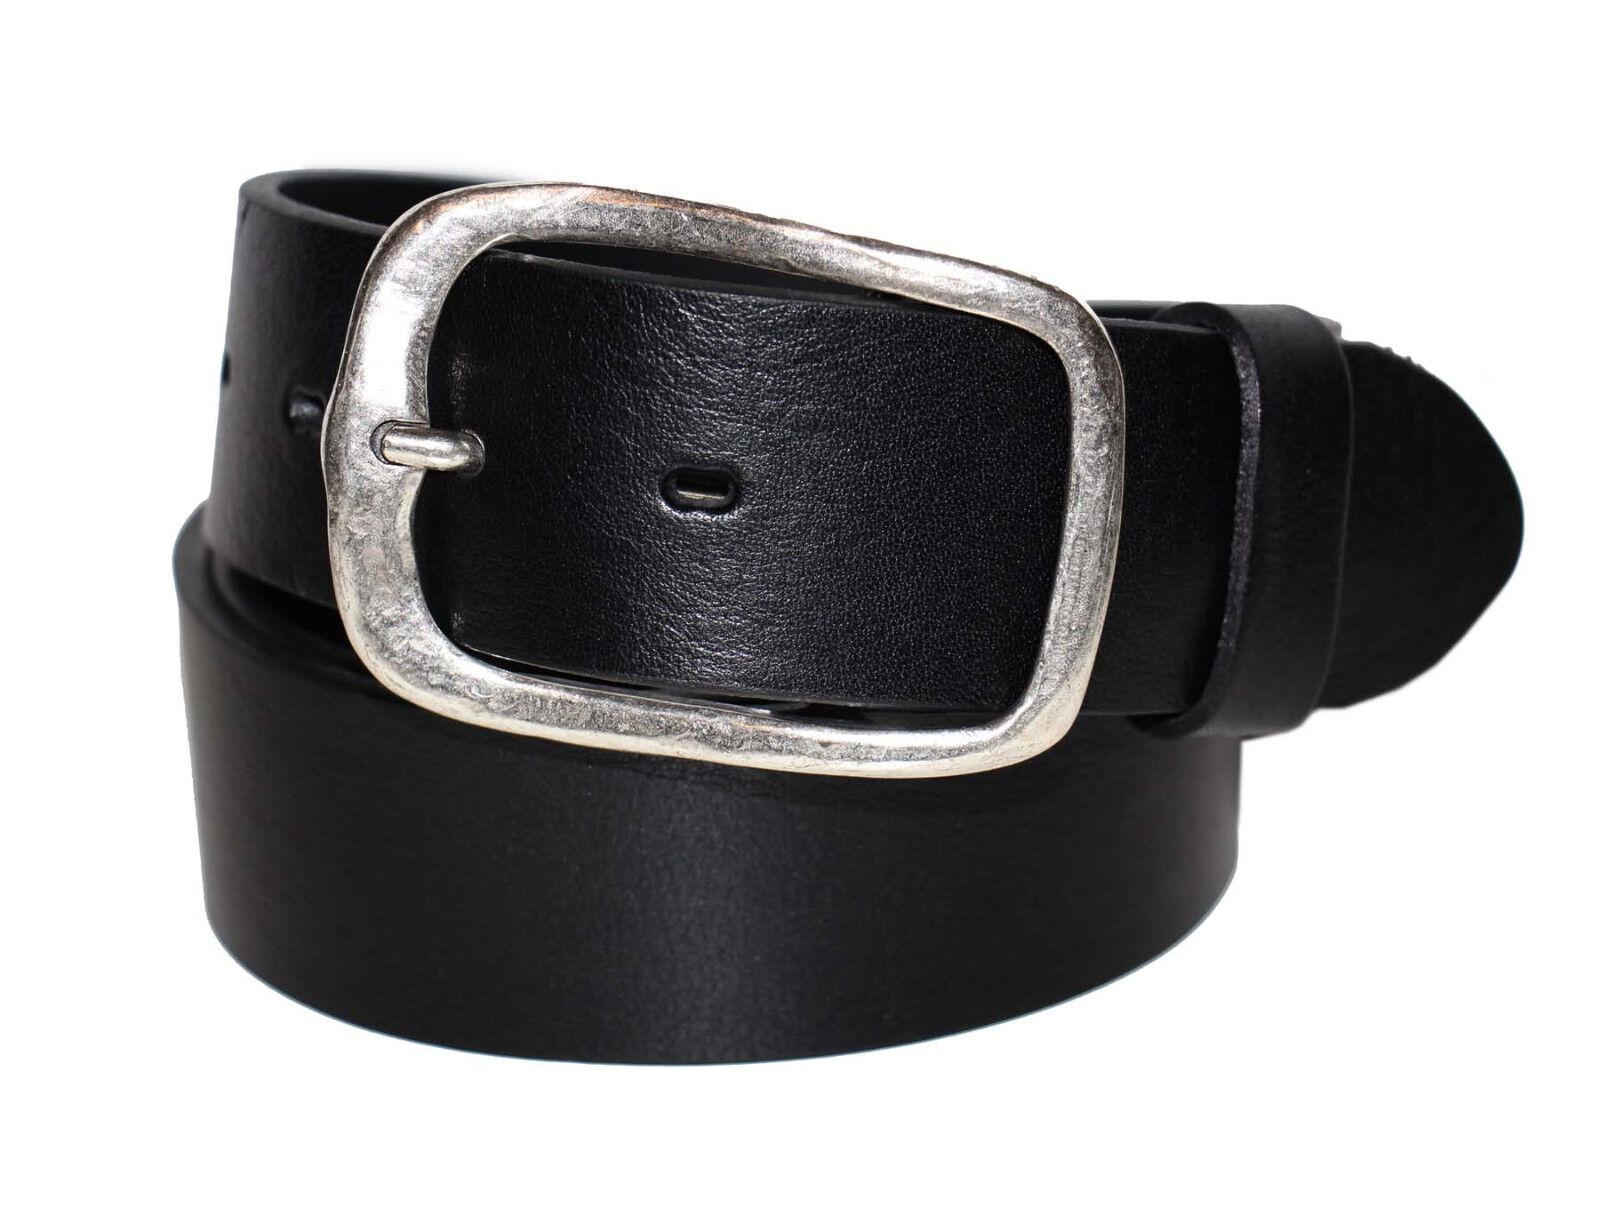 Buckles & Belts Las Vegas Unisex Belt Leder Gürtel Ledergürtel